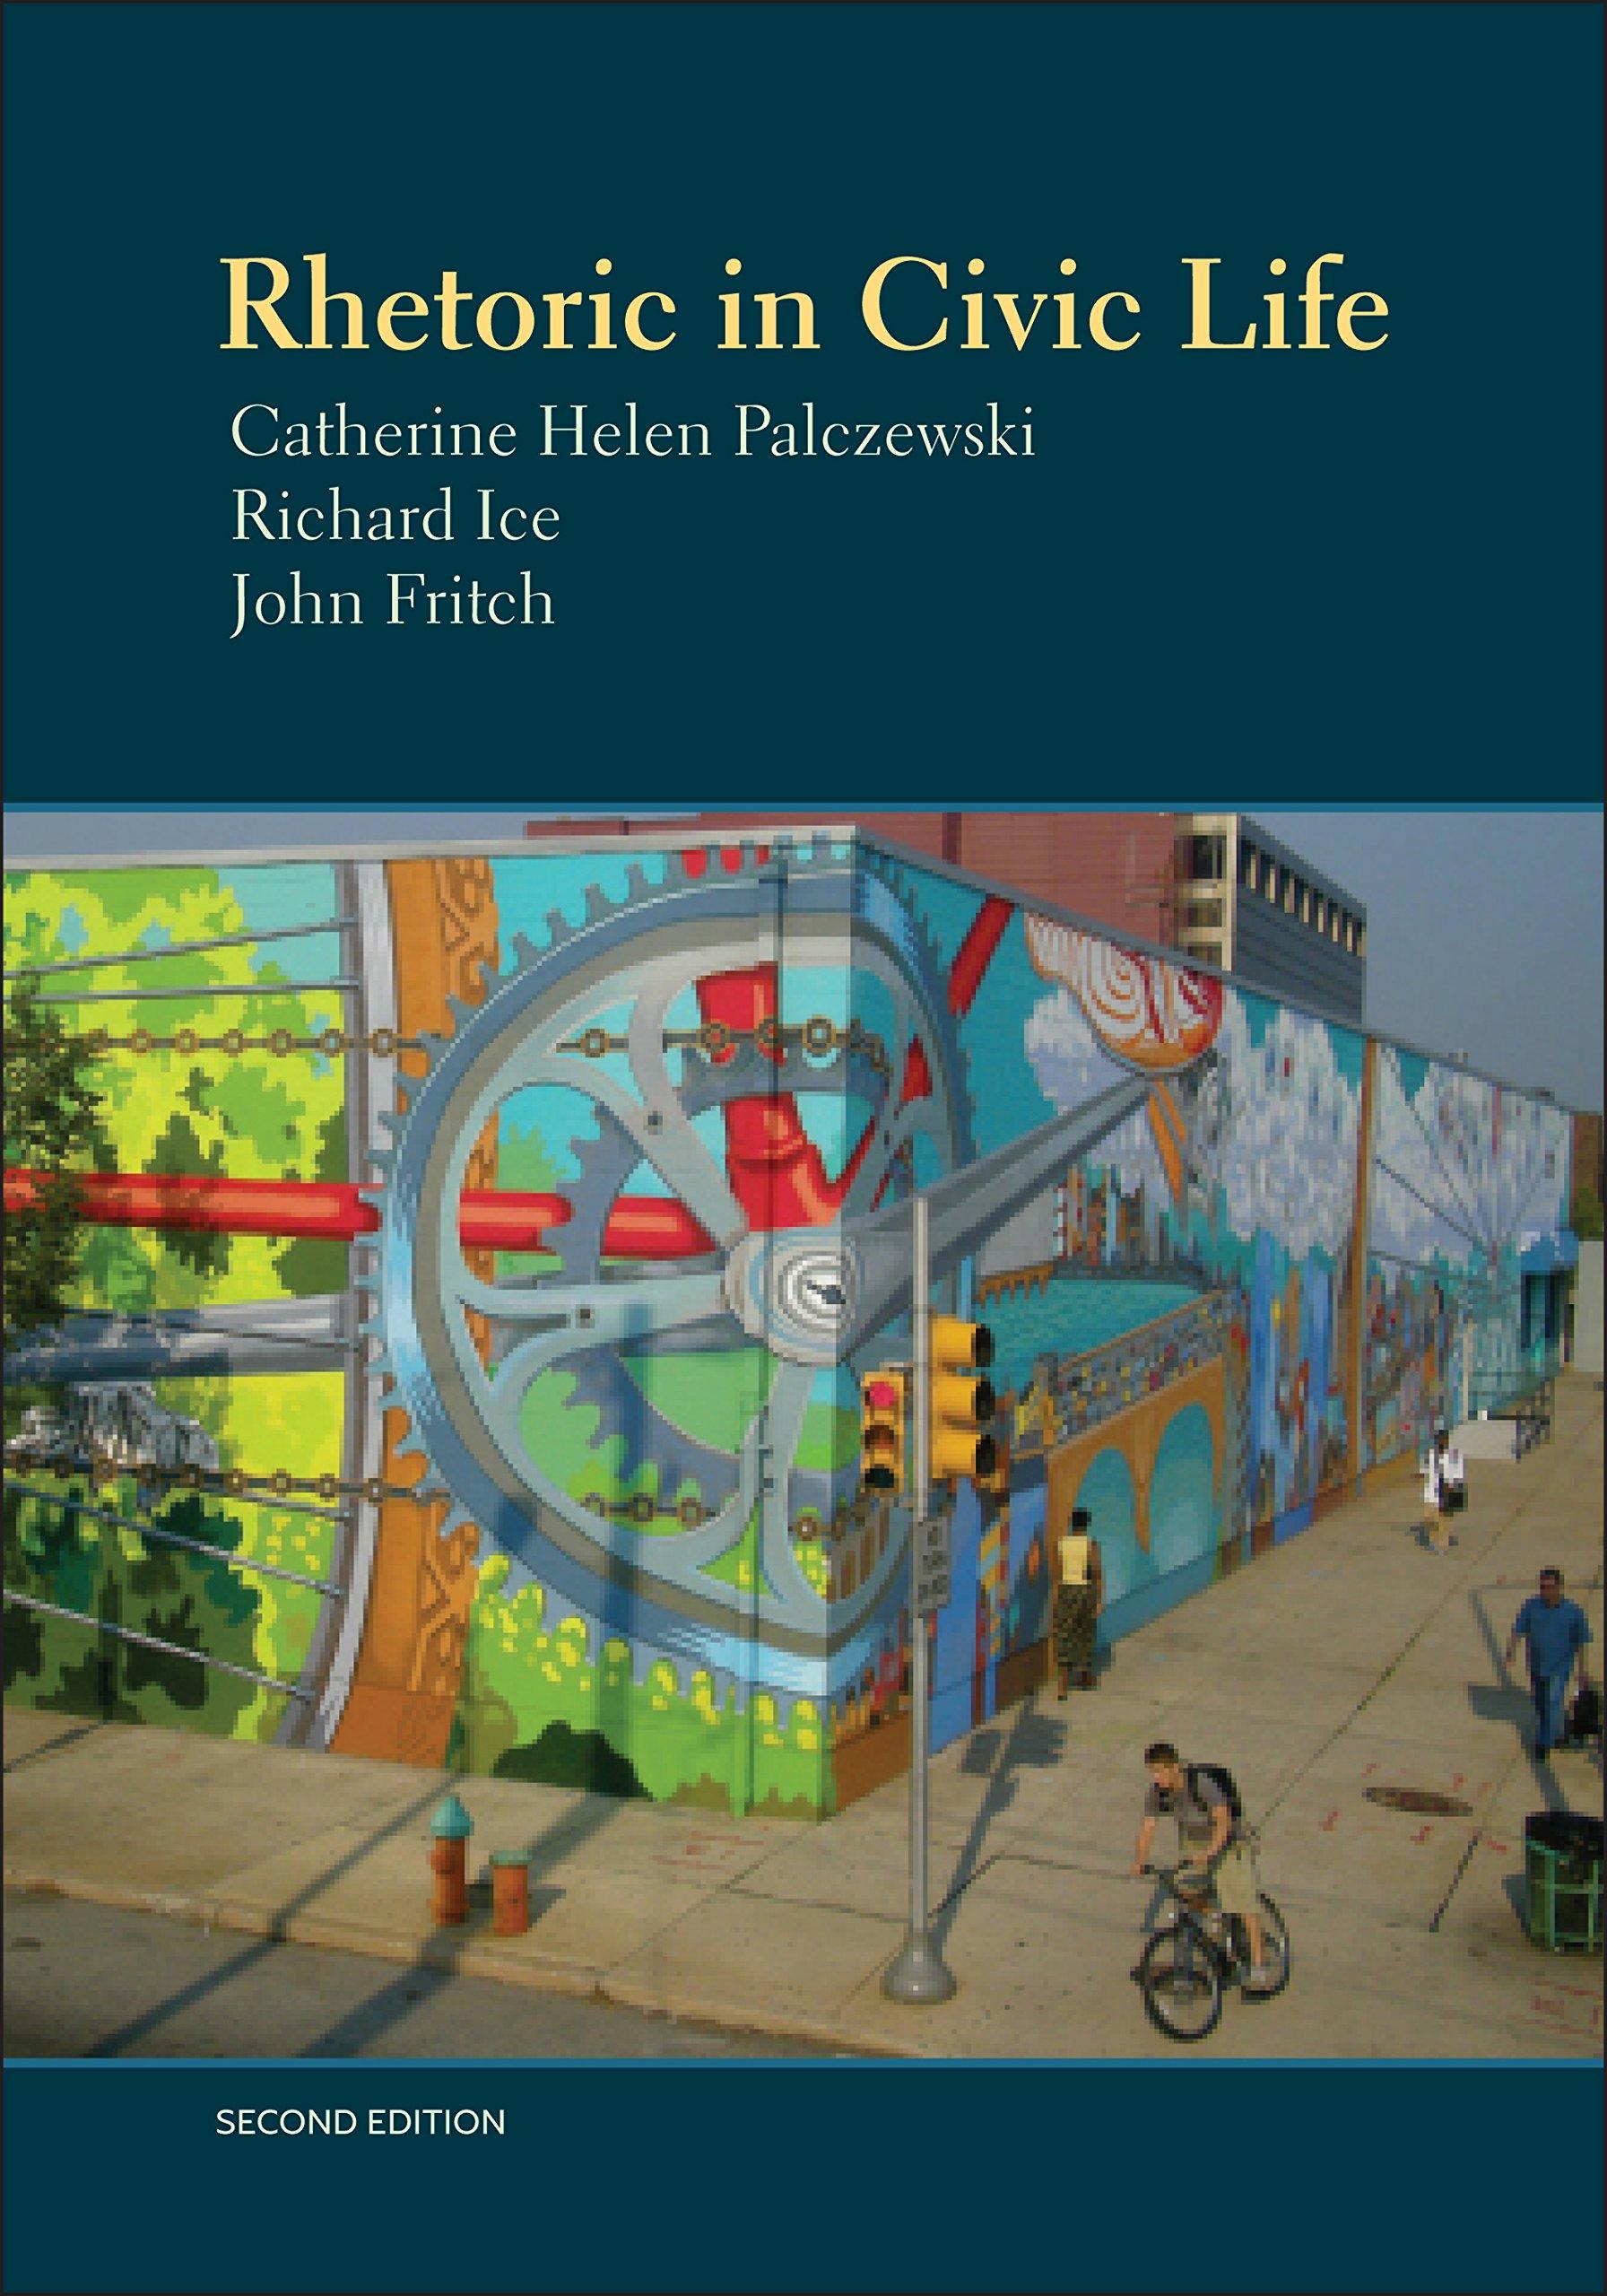 Download Rhetoric in Civic Life, 2nd edition PDF ePub ebook